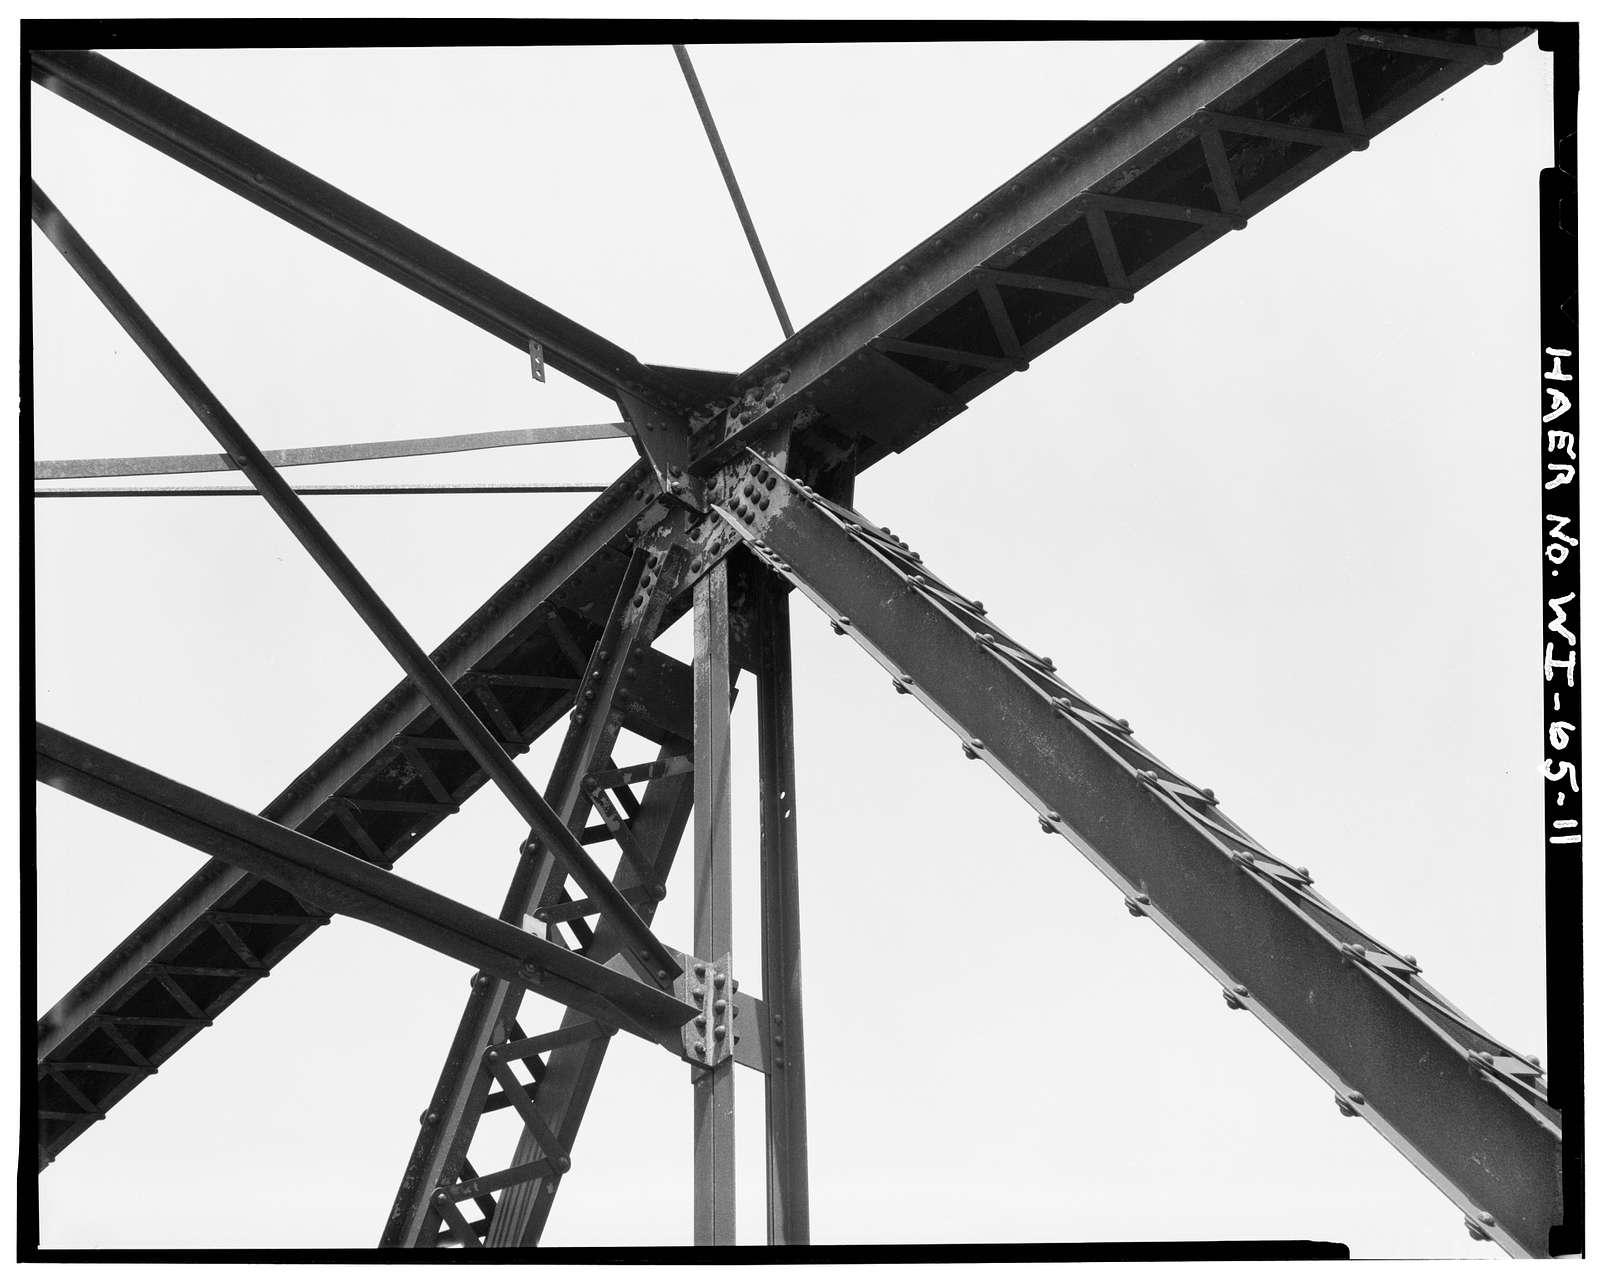 Bridge No. 18, Spanning Kickapoo River, La Farge, Vernon County, WI